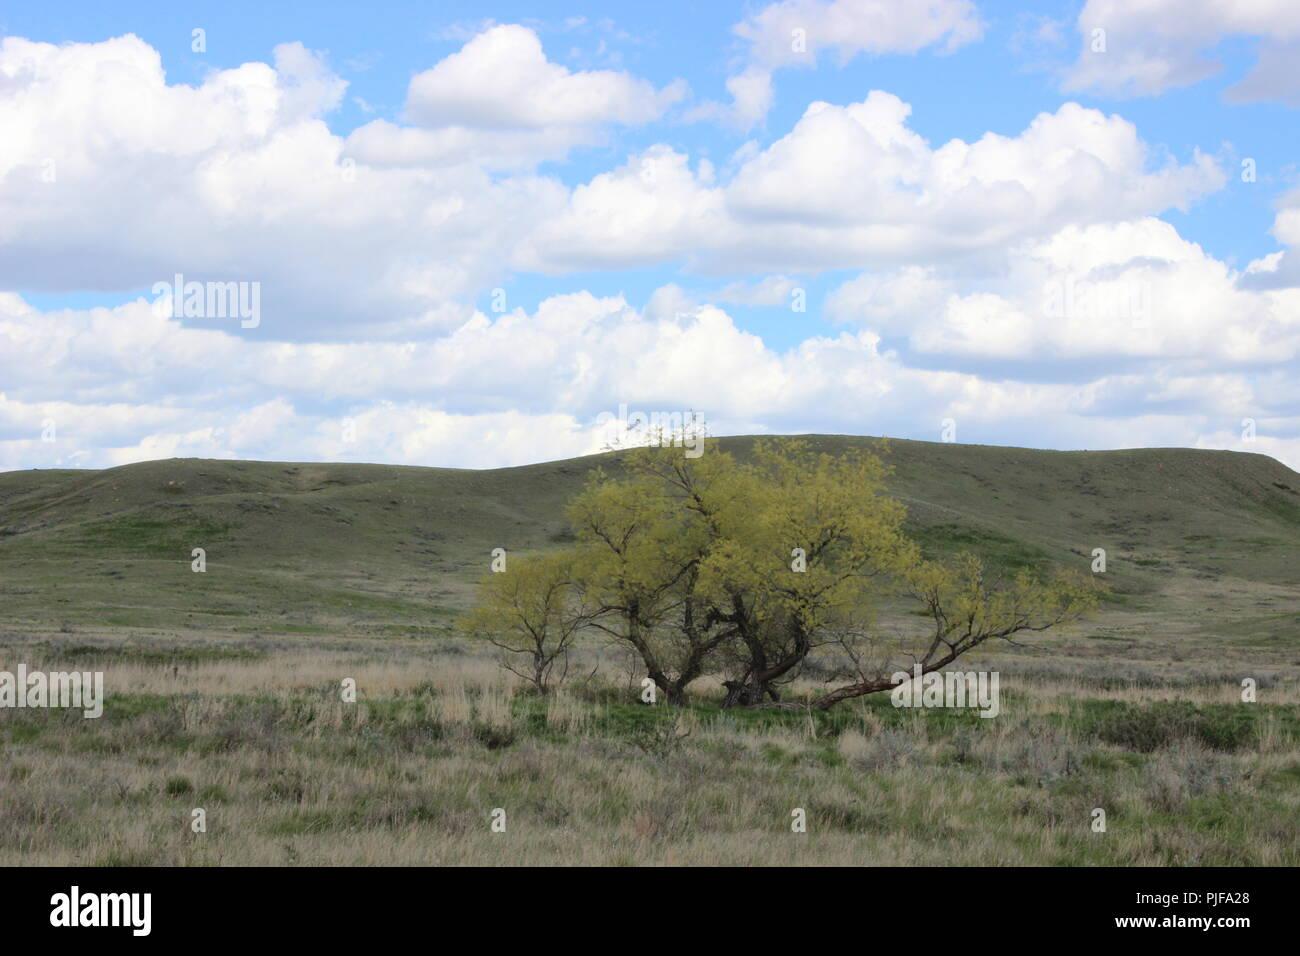 Tree in Grasslands National Park - Stock Image